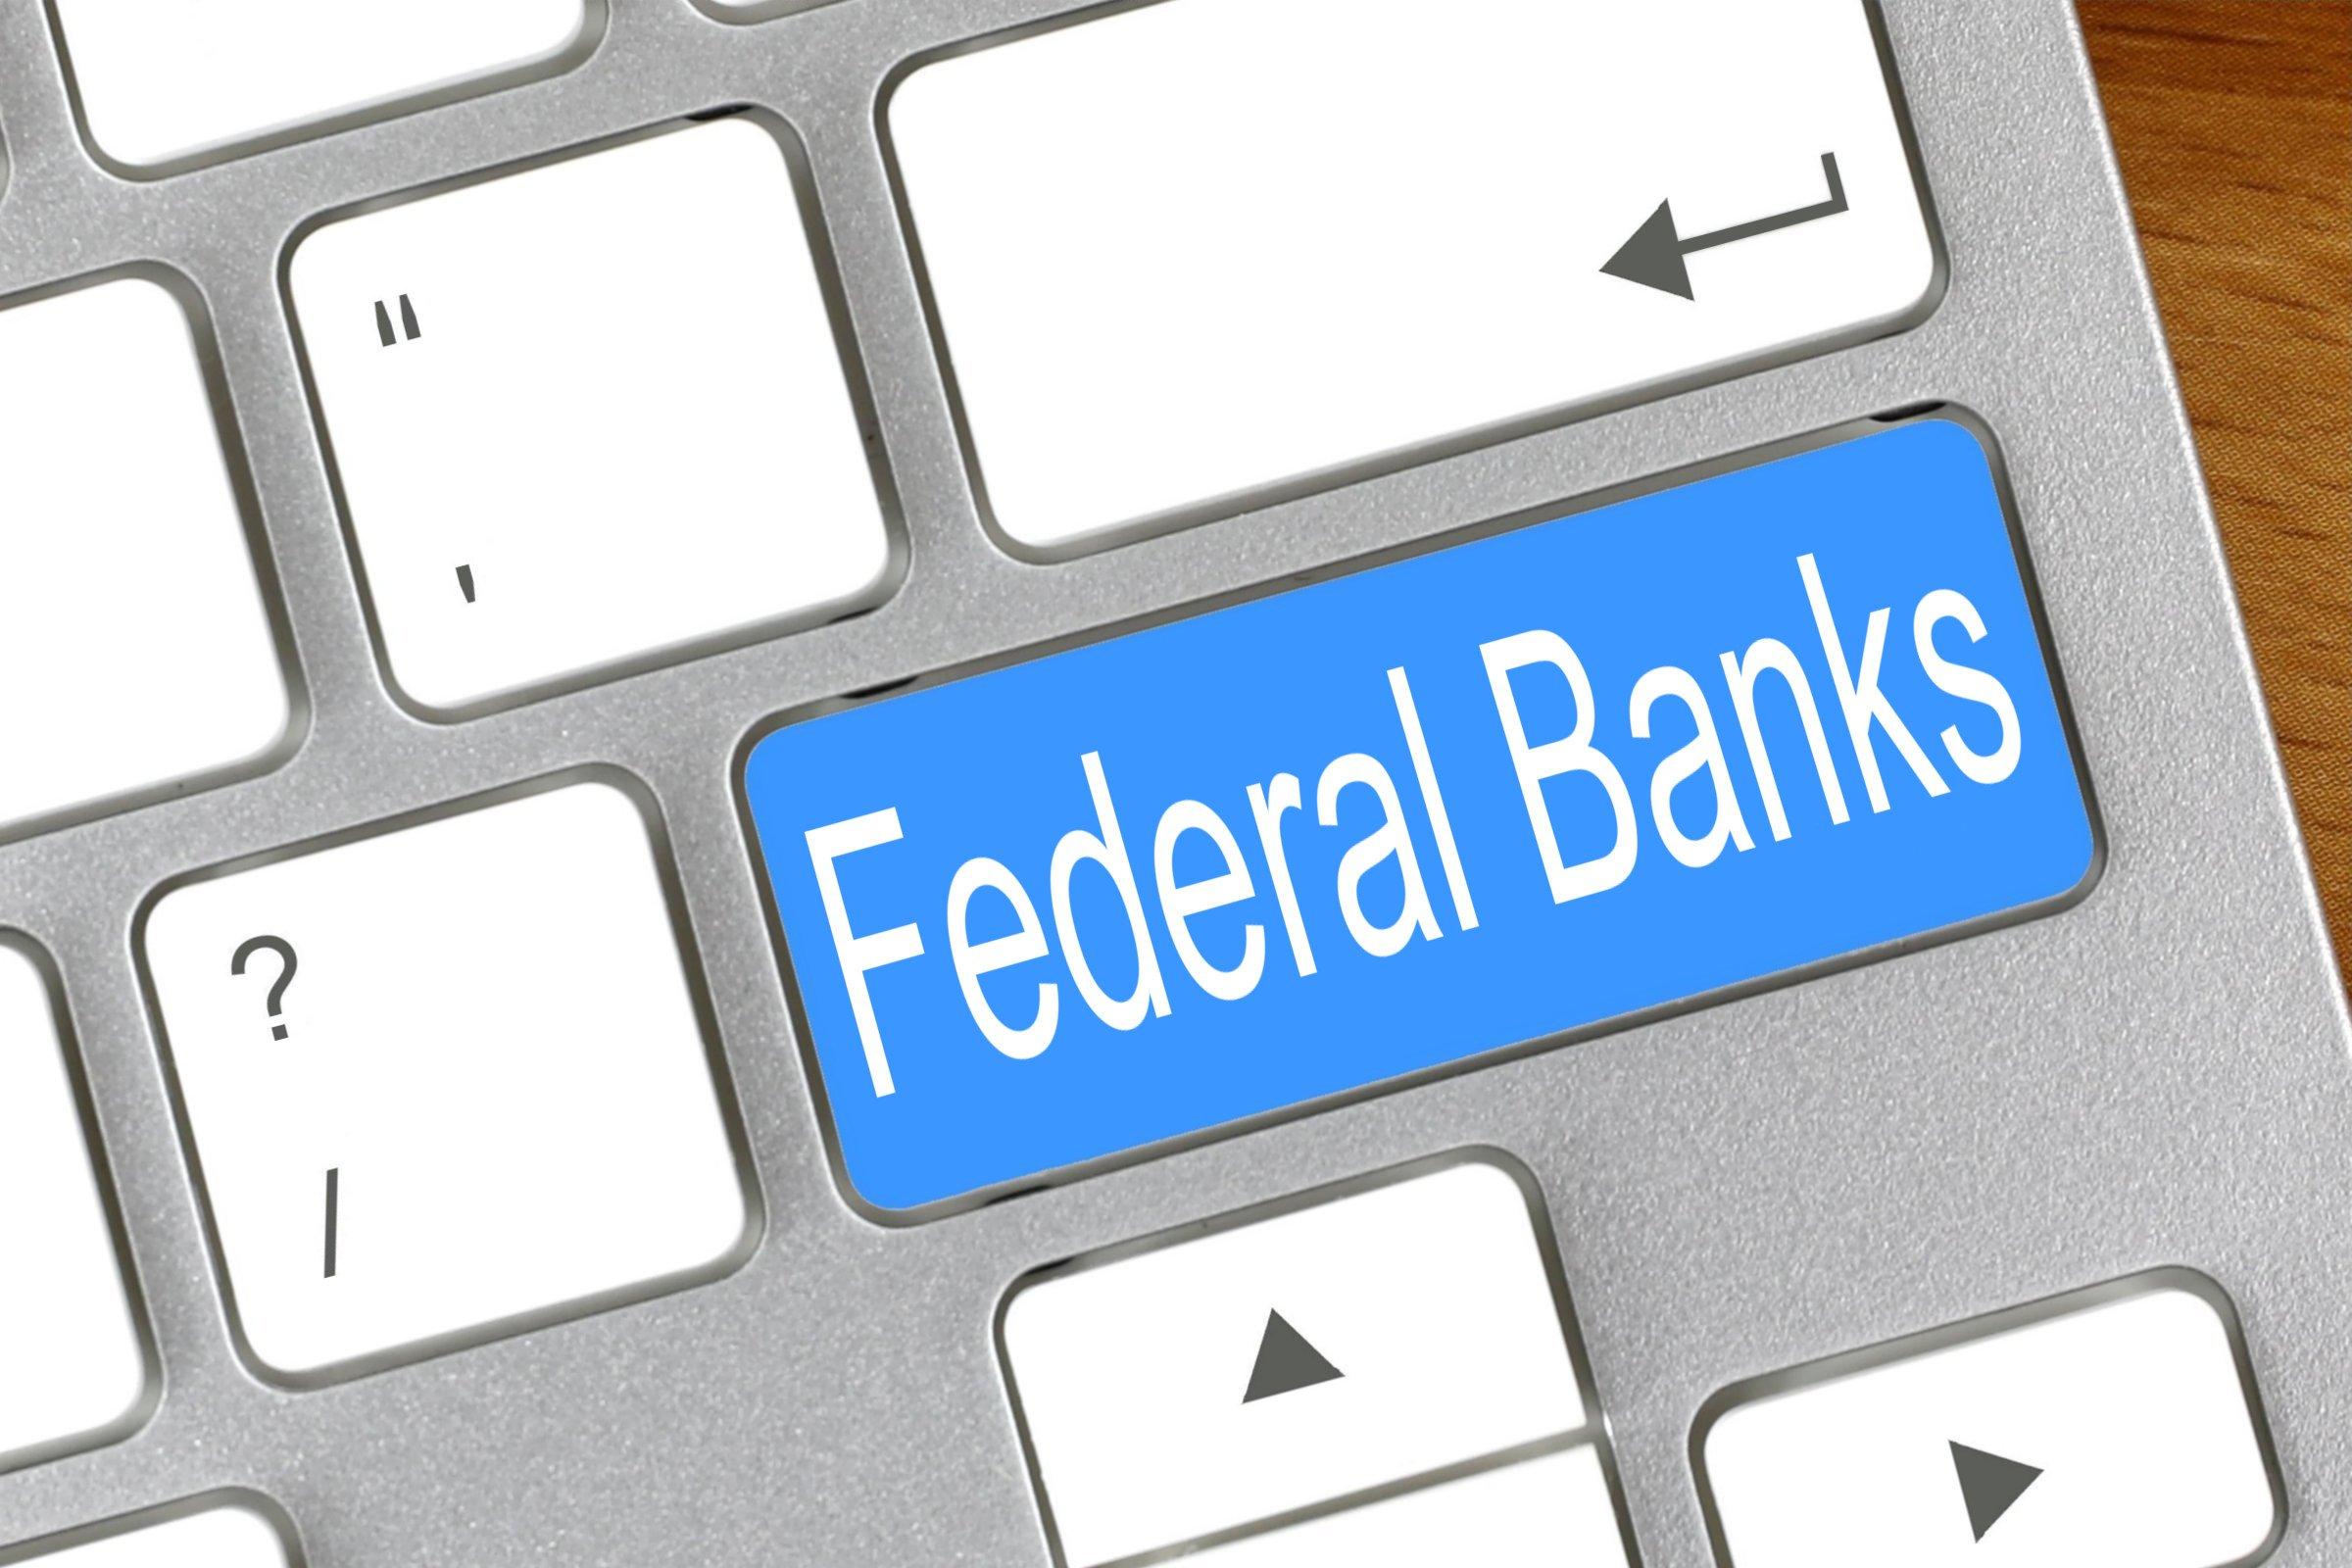 Federal Banks